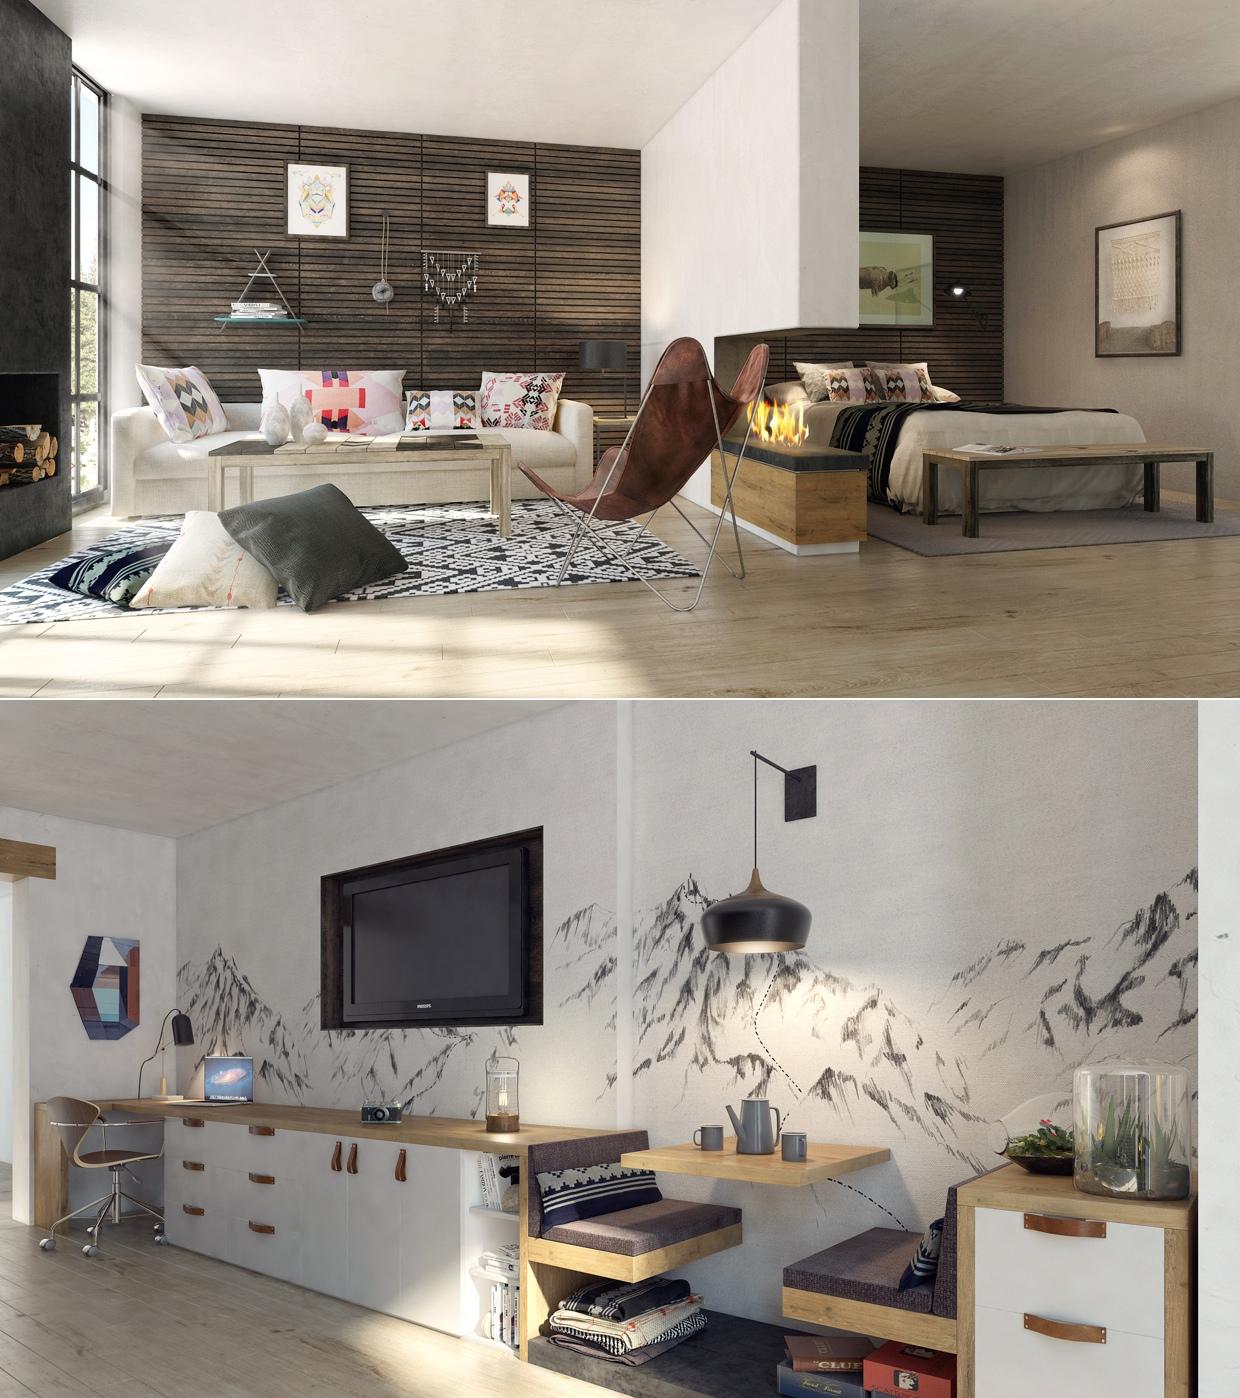 Apartment Wallpaper: Studio Apartment Wallpapers High Quality